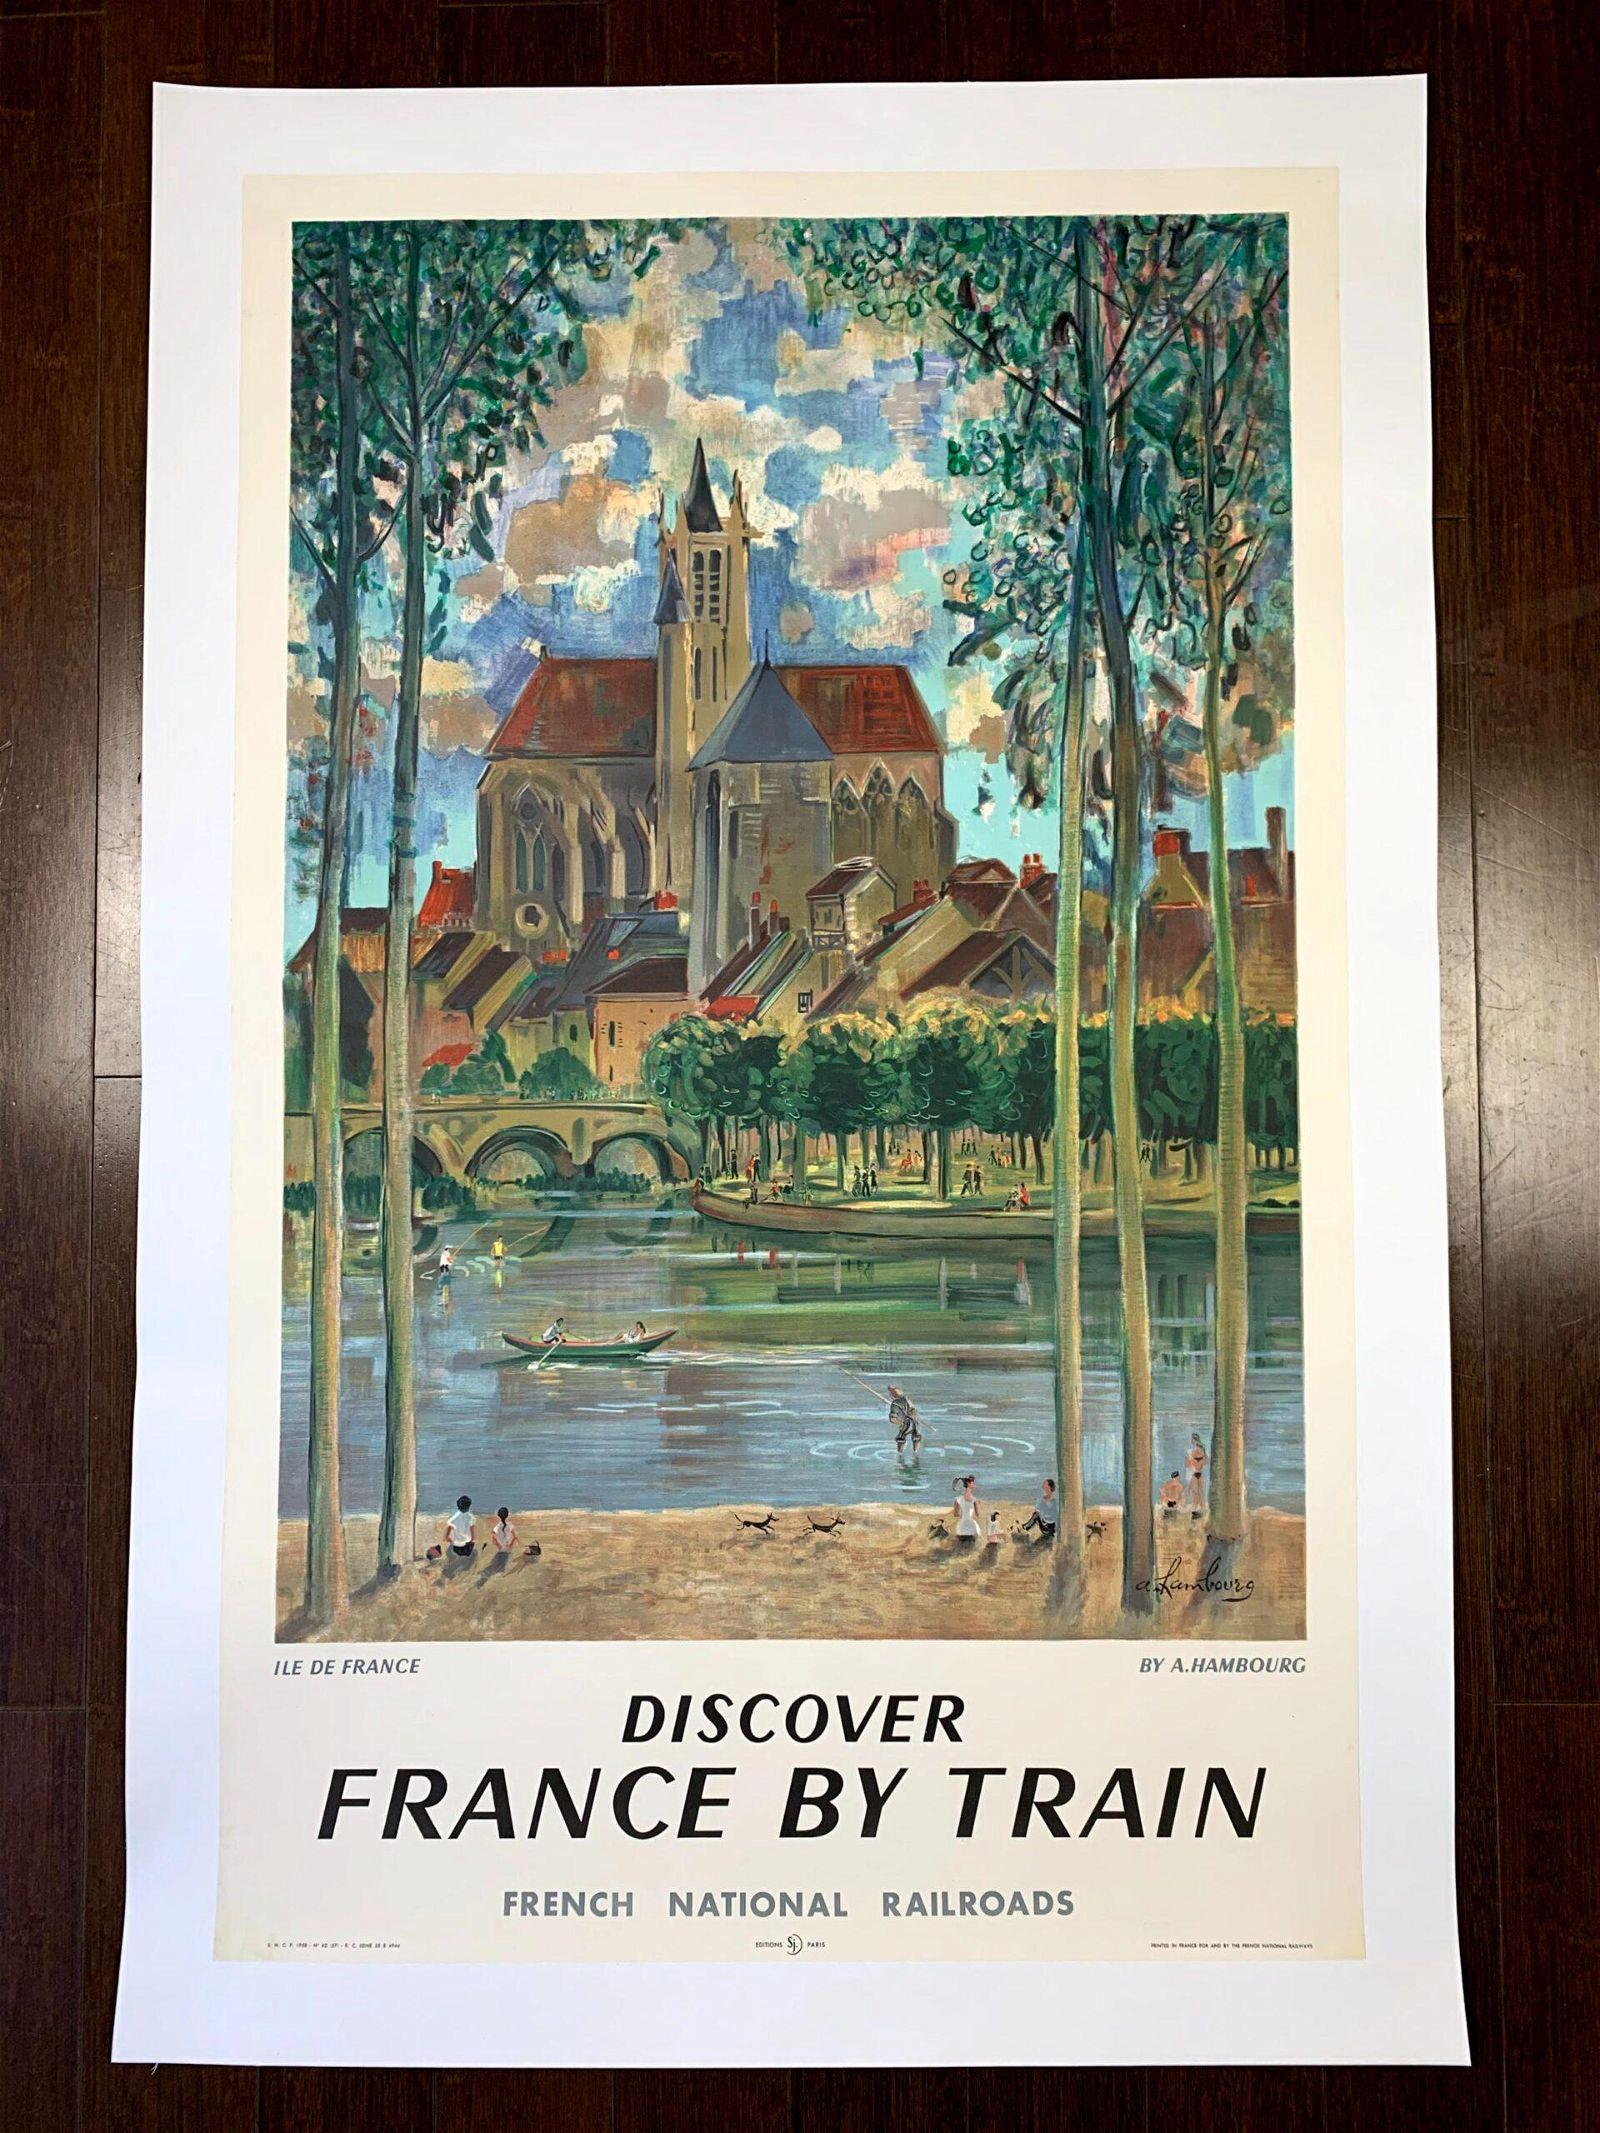 France by Train - Ile De France - Art by A. Durel